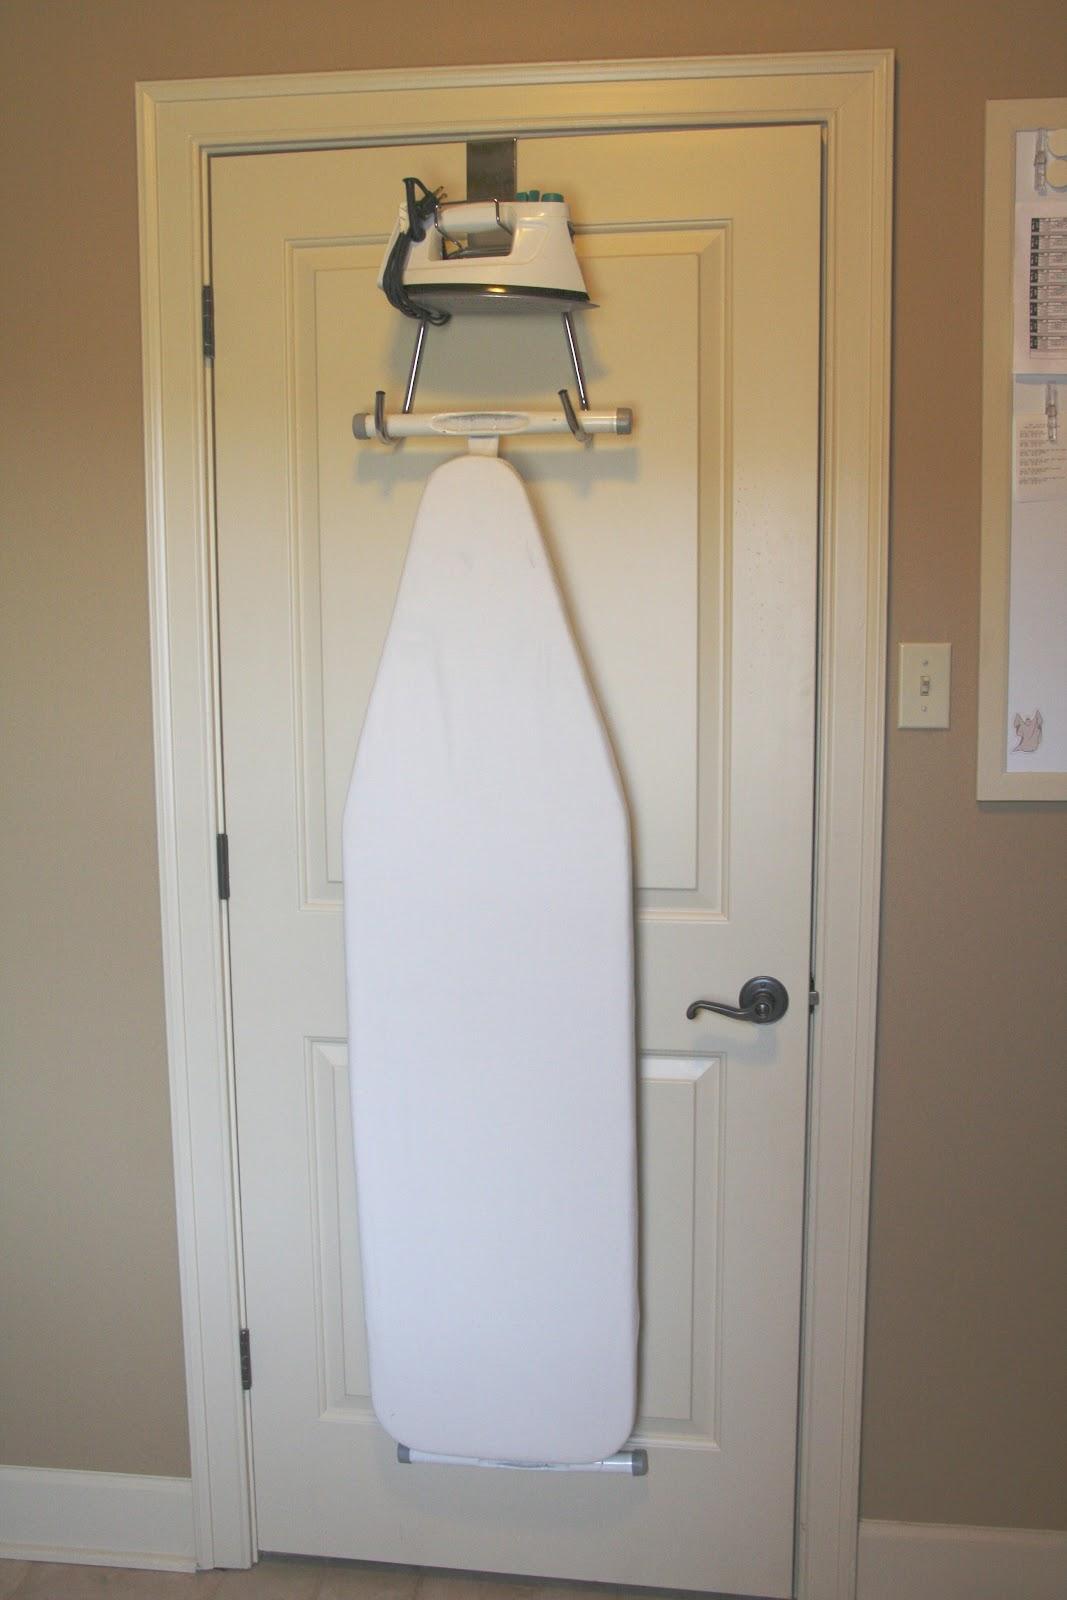 Simple Solution Ironing Board Organizer Simply Organized